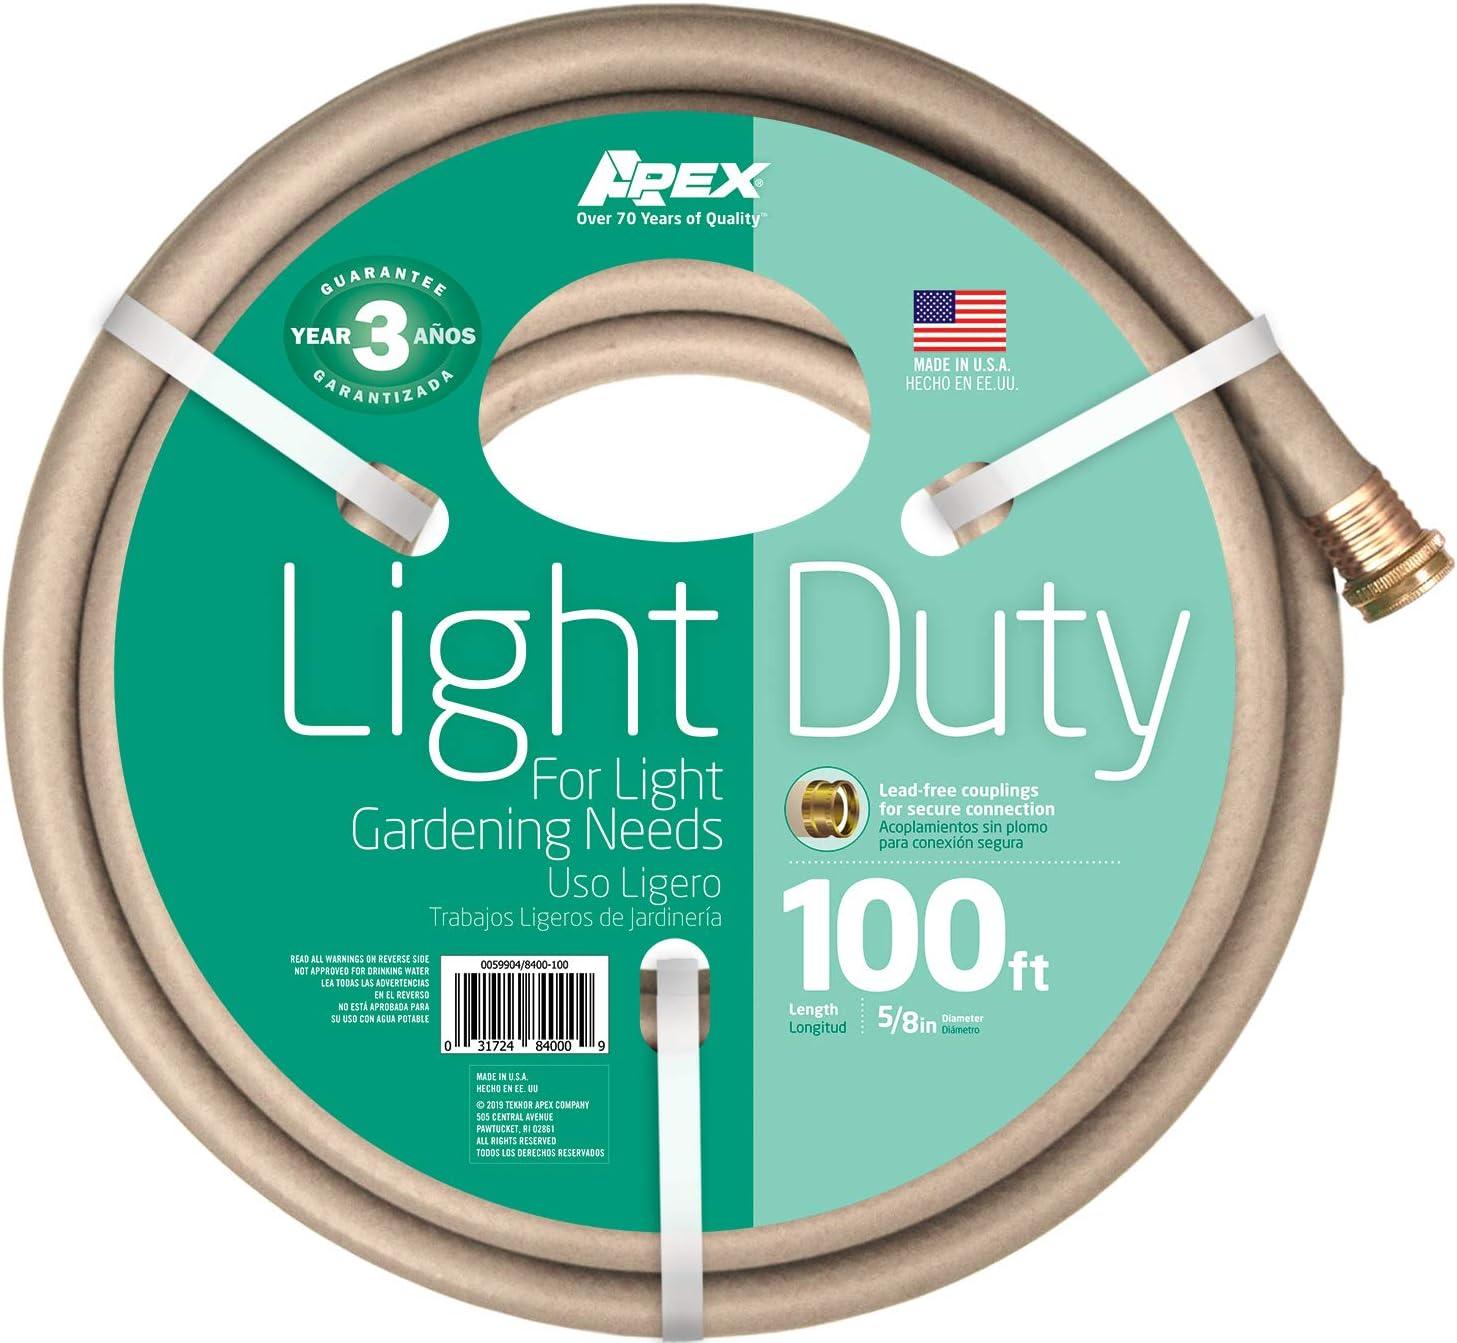 Apex, 8400-100, Light Duty Garden Hose, 5/8-Inch by 100-Feet